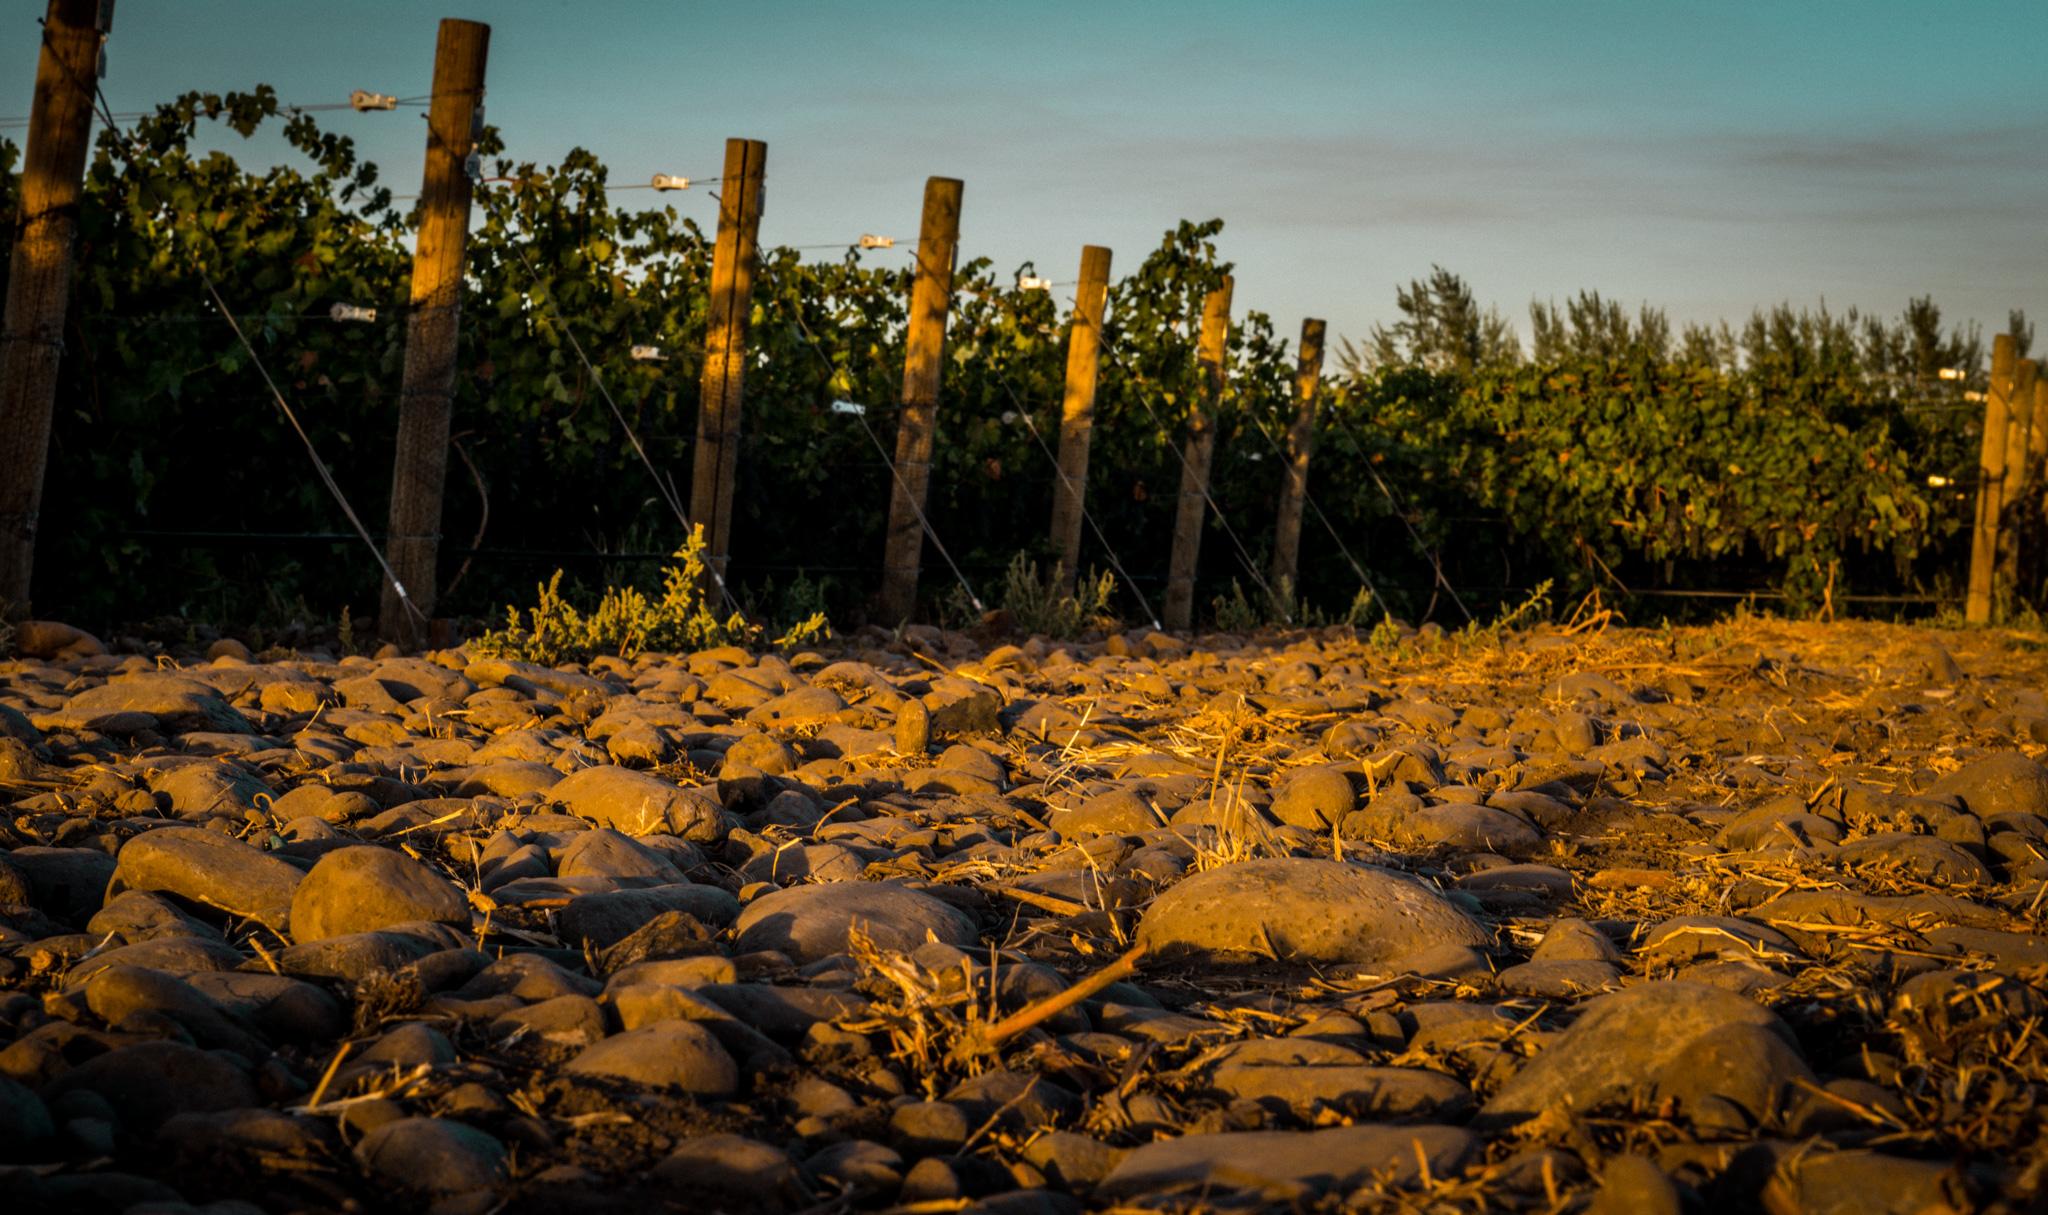 US : Washington : The Rocks AVA in Milton-Freewater